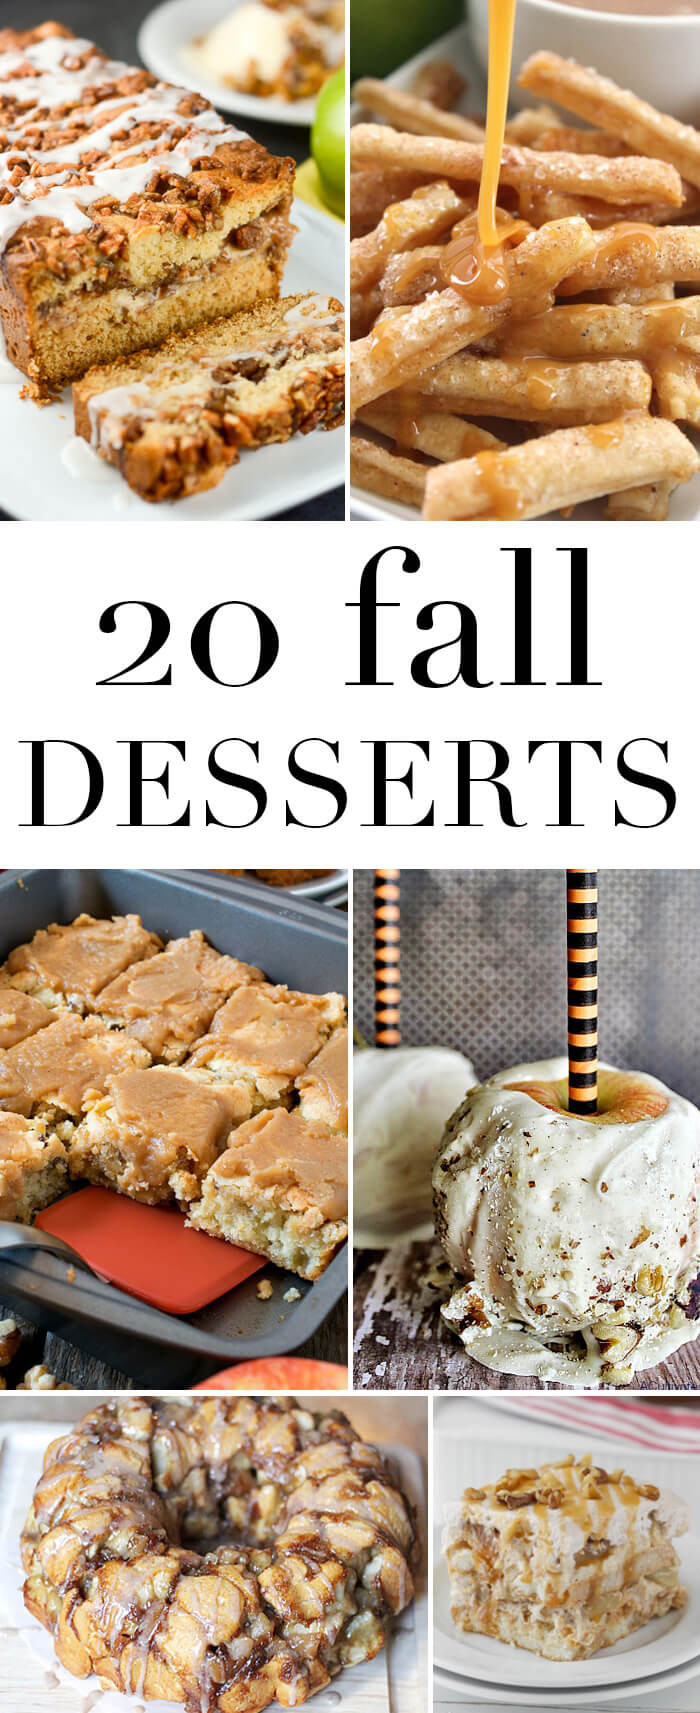 Fall Flavors For Desserts  20 Fall Dessert Recipes Savor Savvy